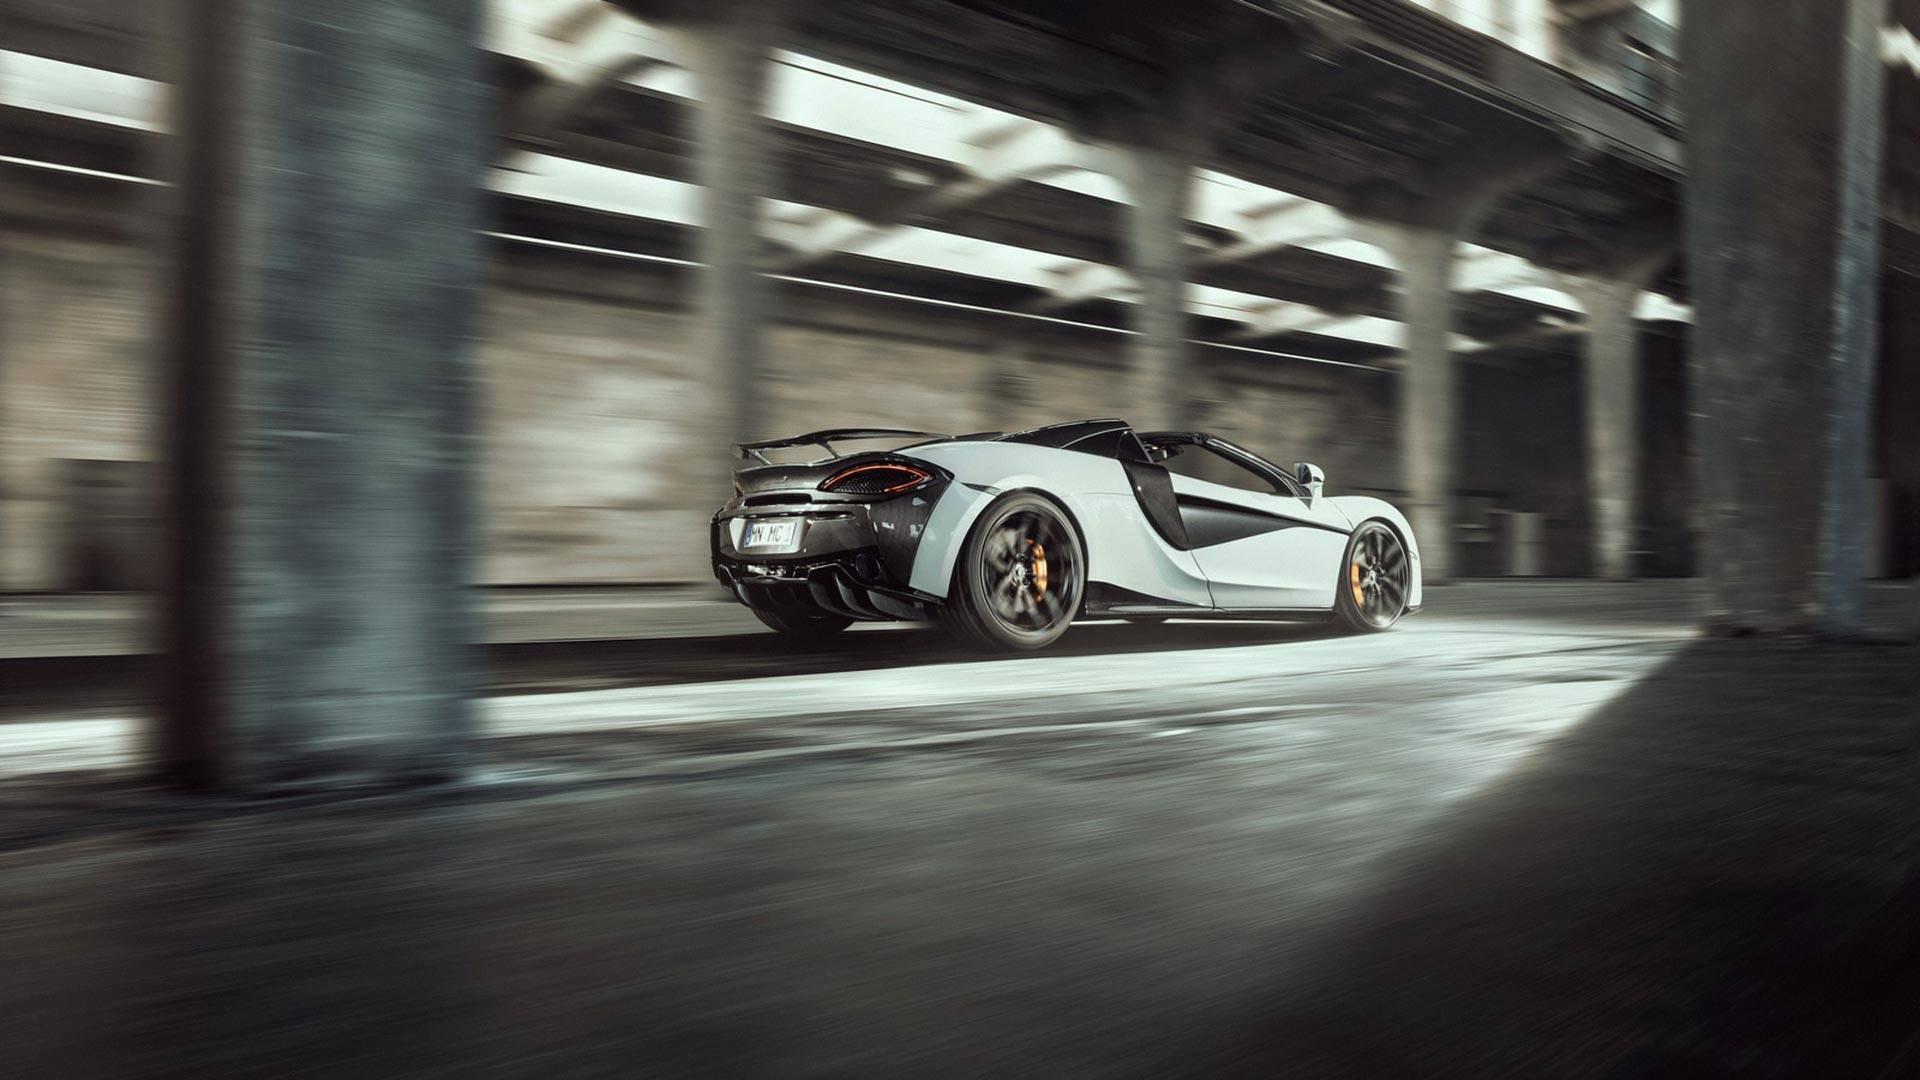 2018 NOVITEC McLaren 570S Spider Rear Three-Quarter Wallpapers (2)